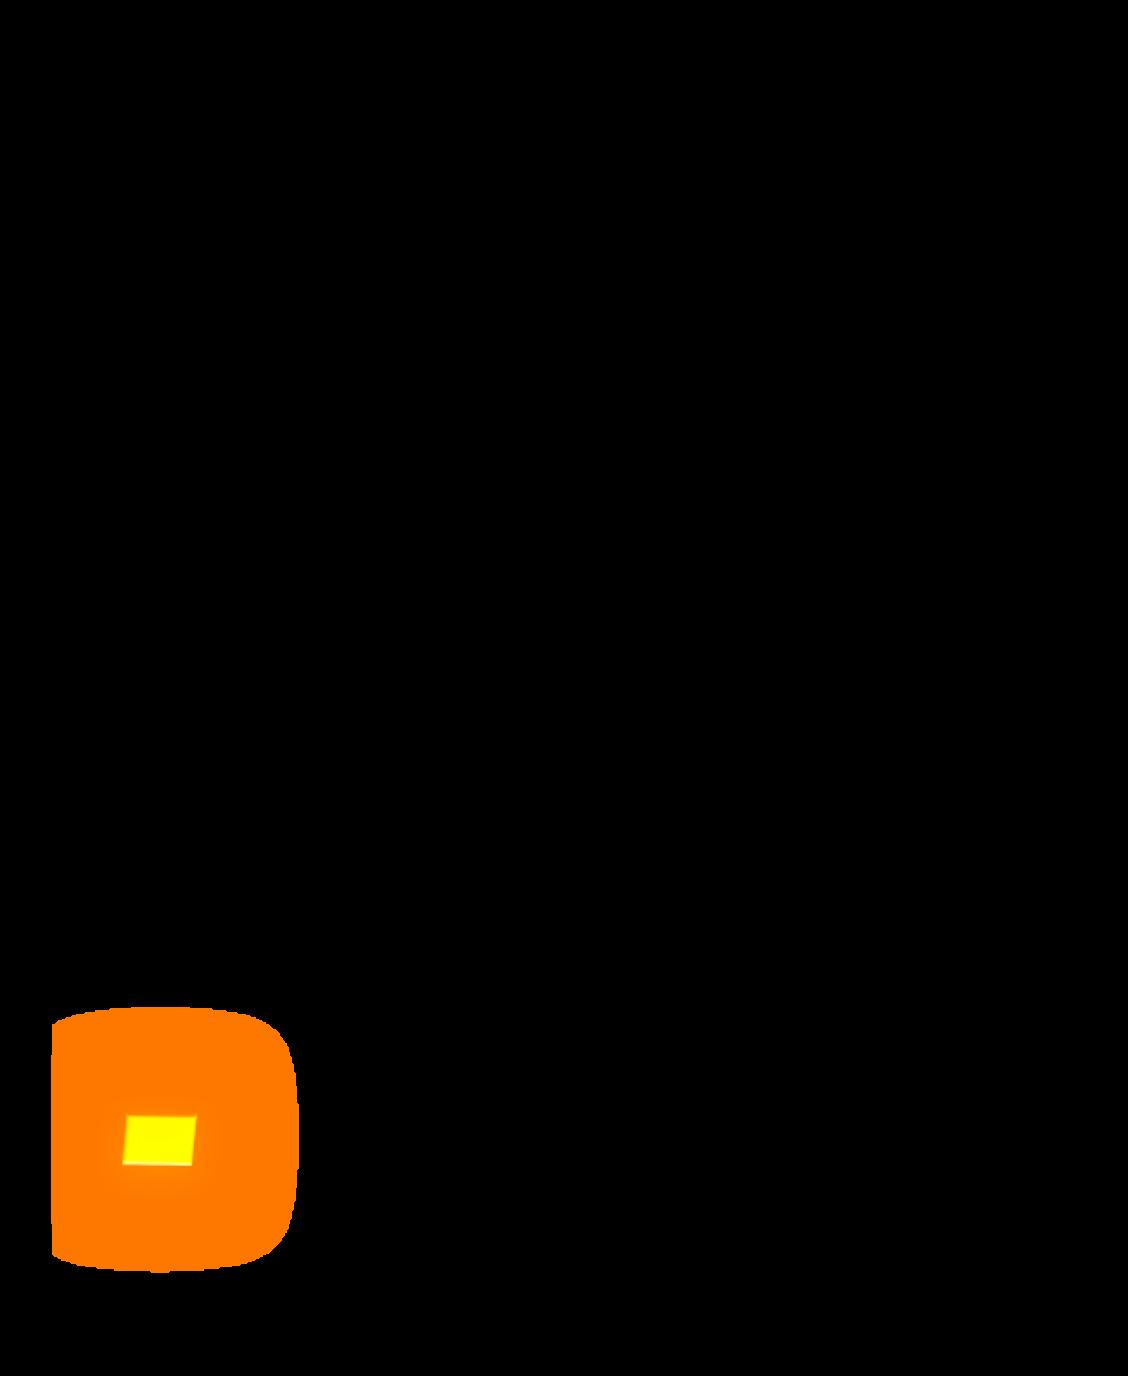 AORUS RTX 2070 GAMING BOX | 그래픽카드(VGA) - GIGABYTE Korea